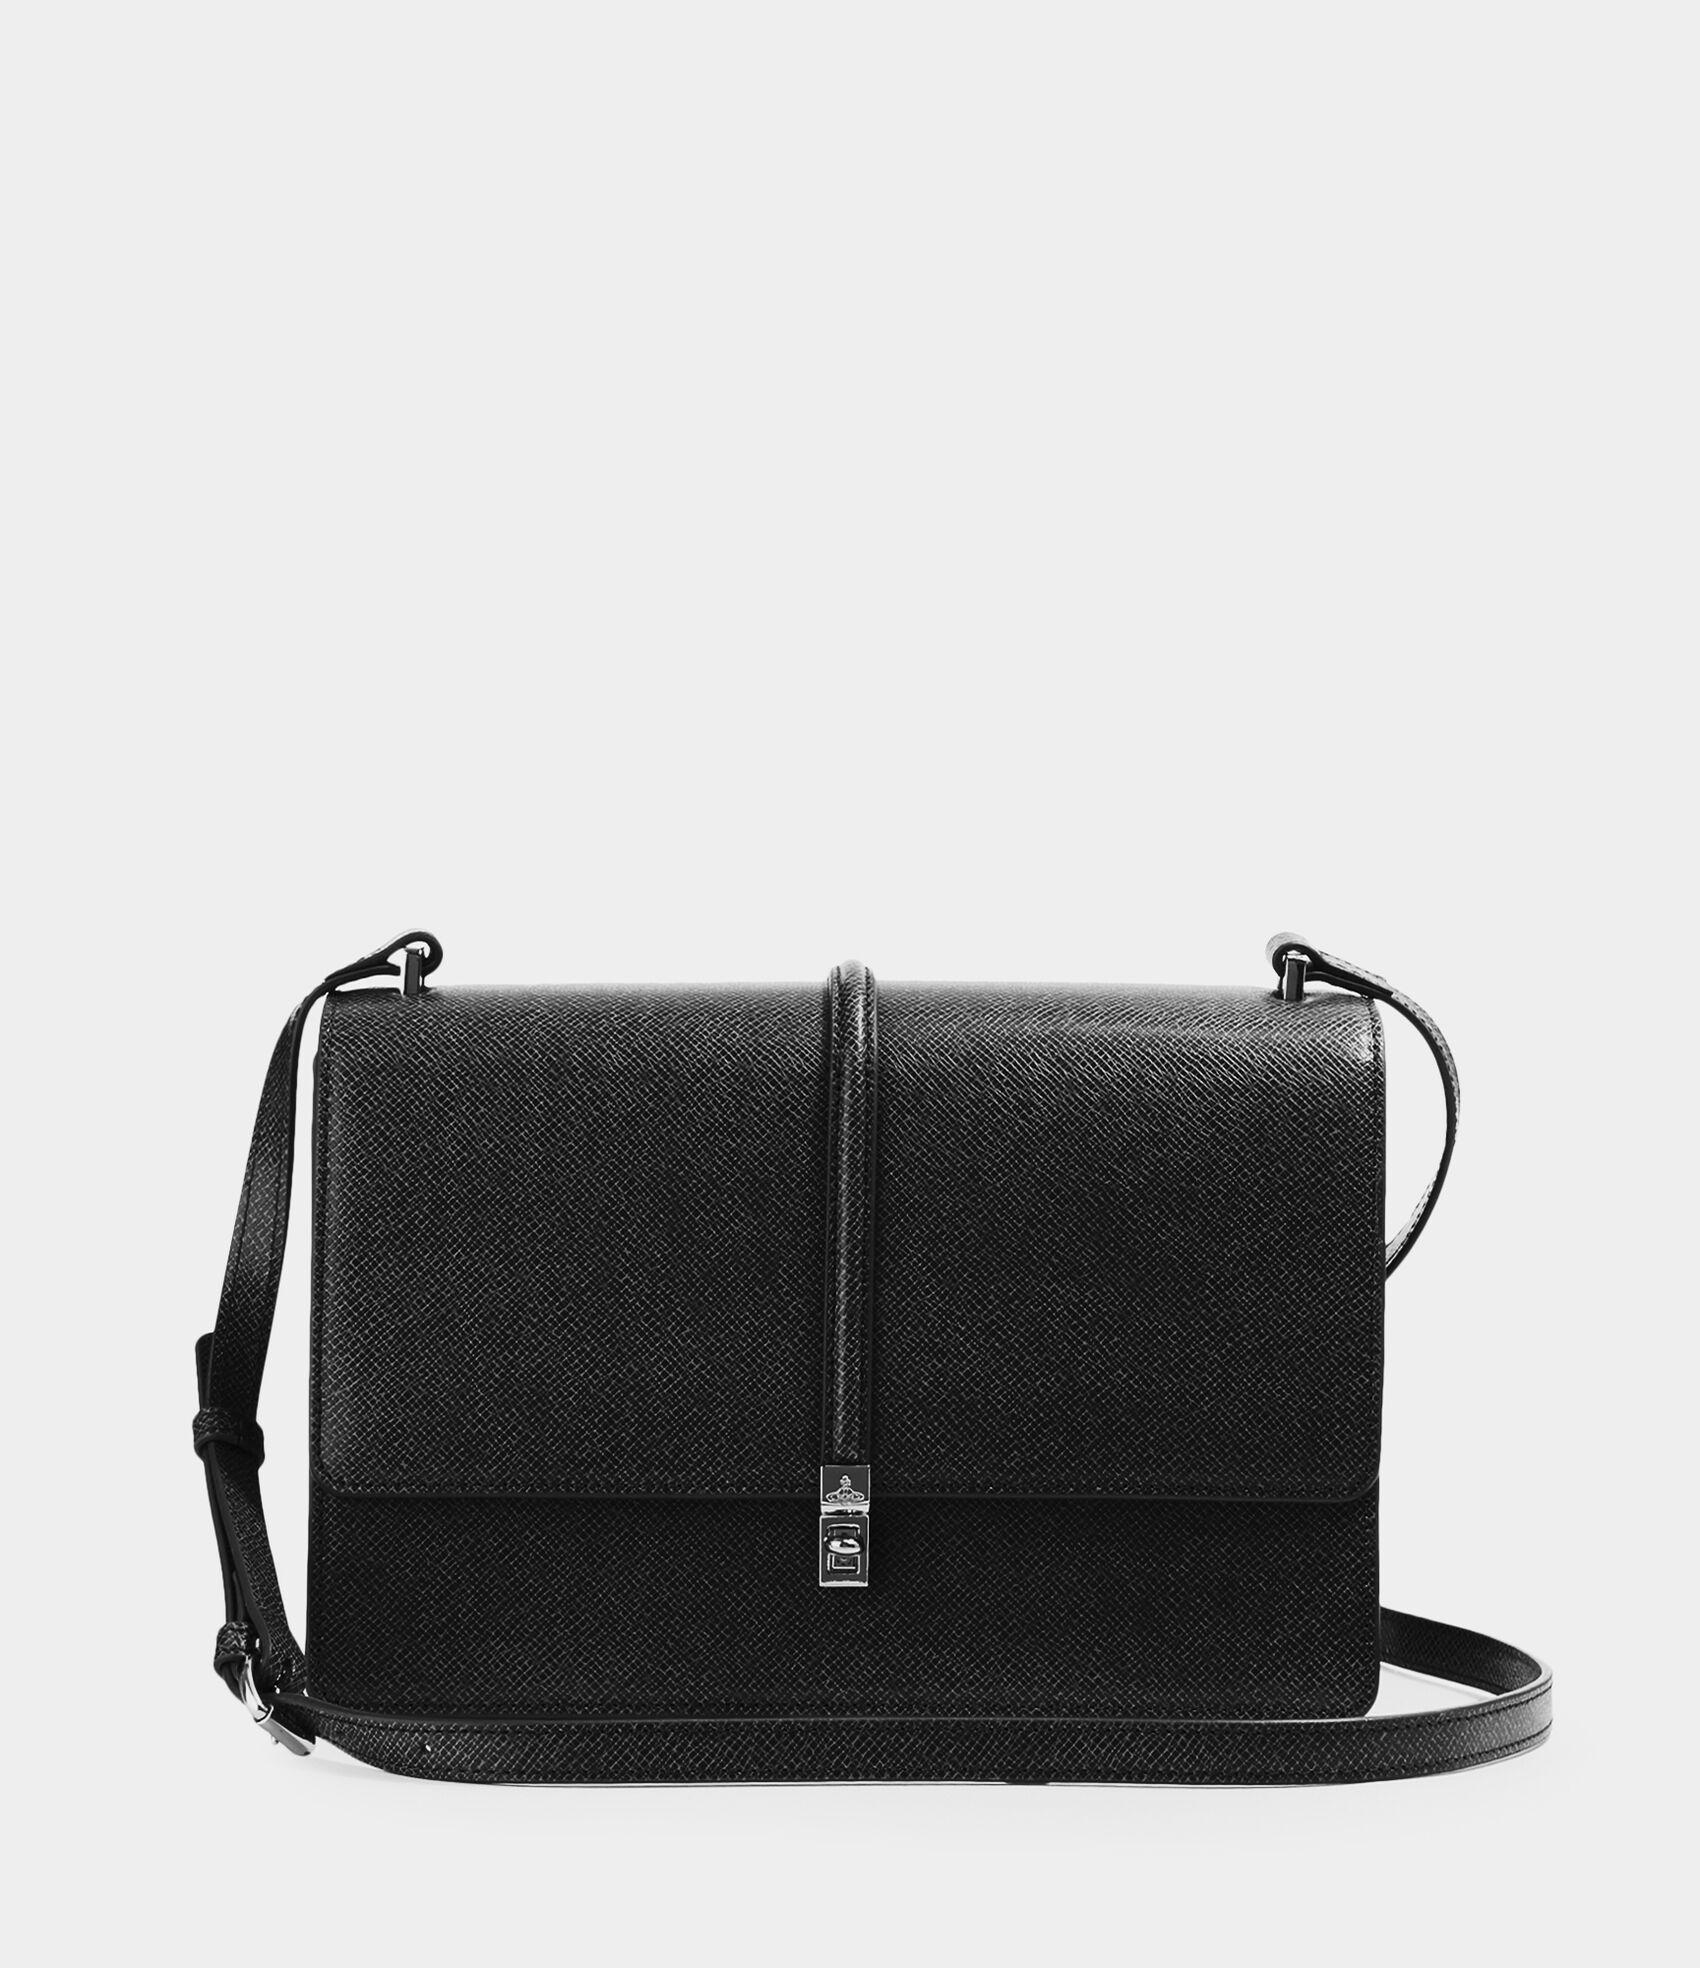 54bce0040 Vivienne Westwood Women's Designer Crossbody Bags | Women's ...